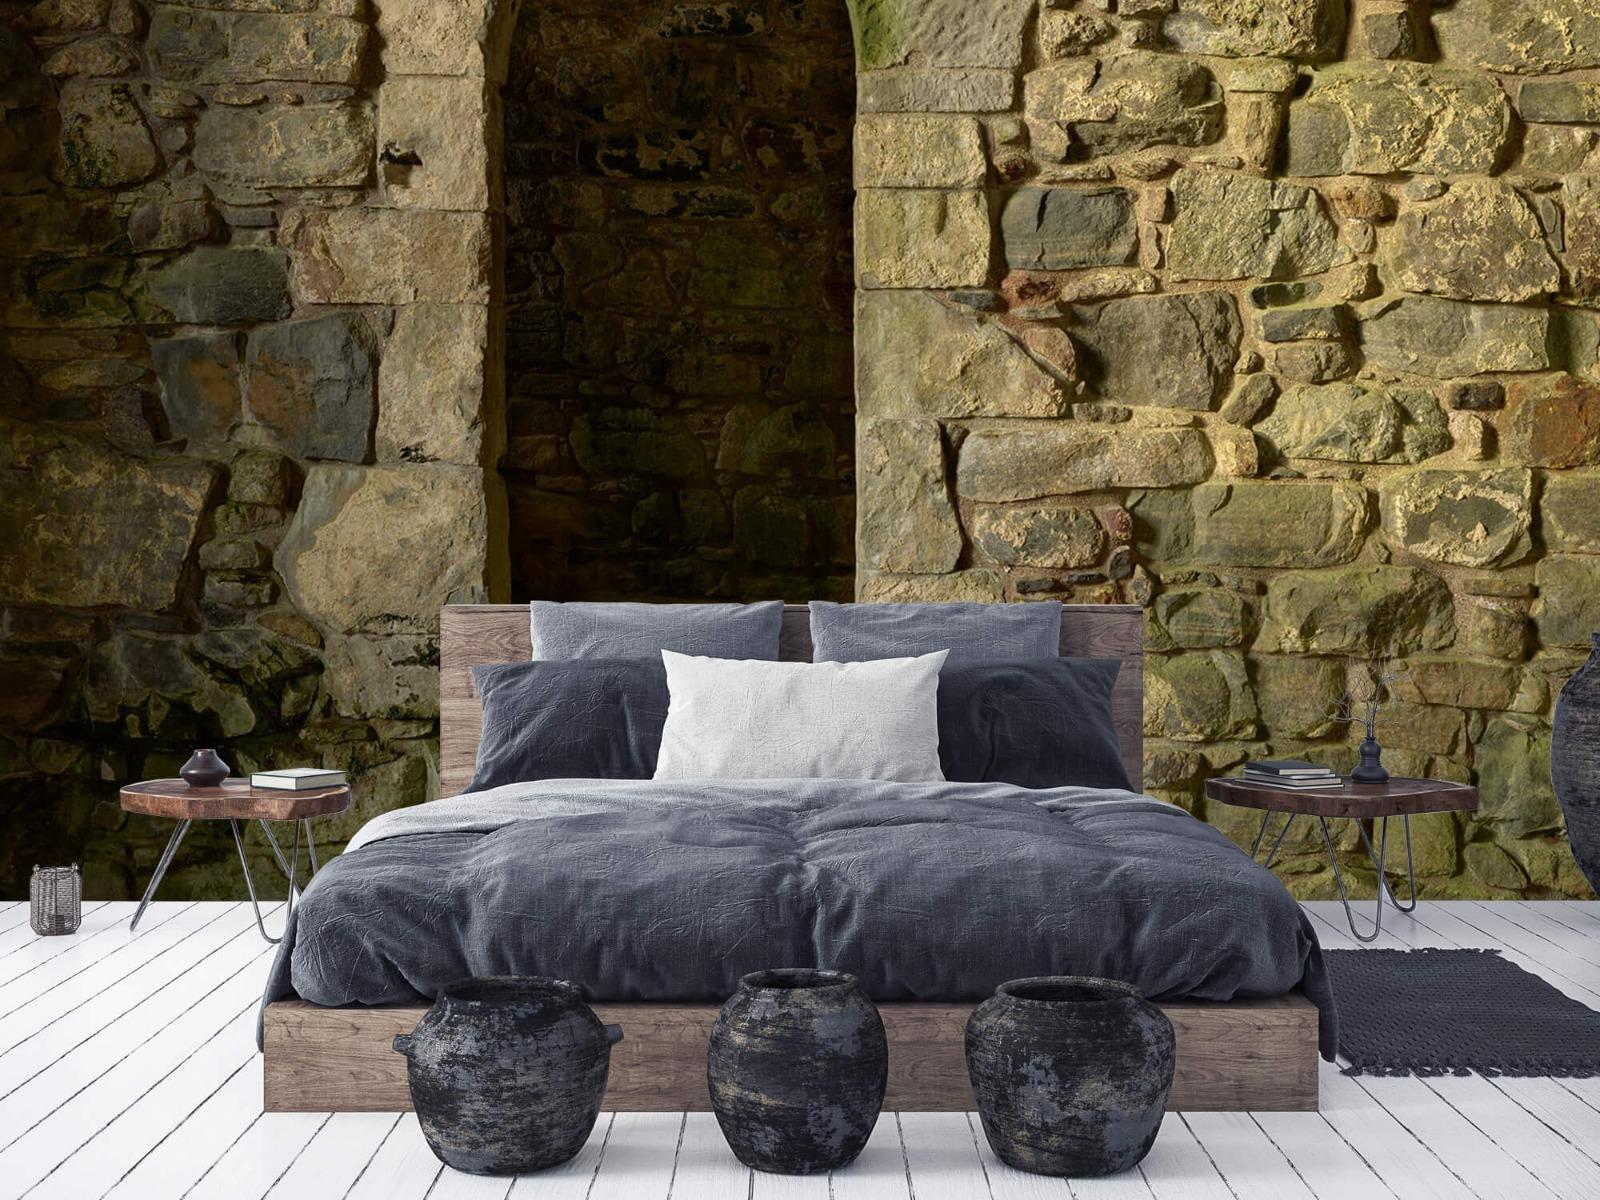 Steen behang - Oude muur met doorgang - Slaapkamer 6